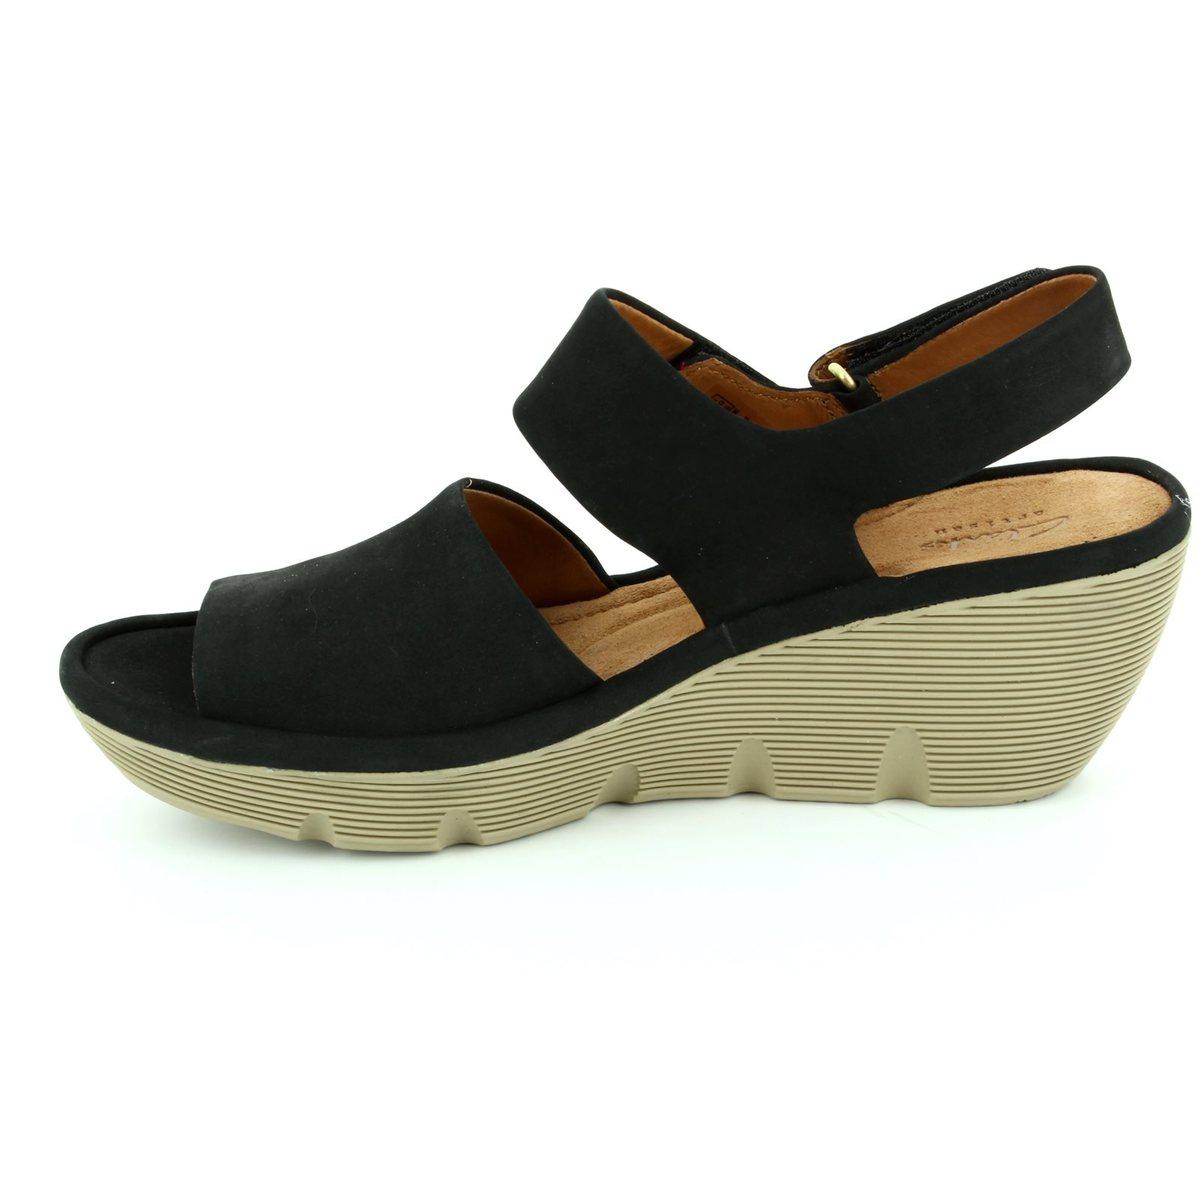 8d7aa5c0add Clarks Sandals - Black nubuck - 2428 04D CLARENE ALLURE